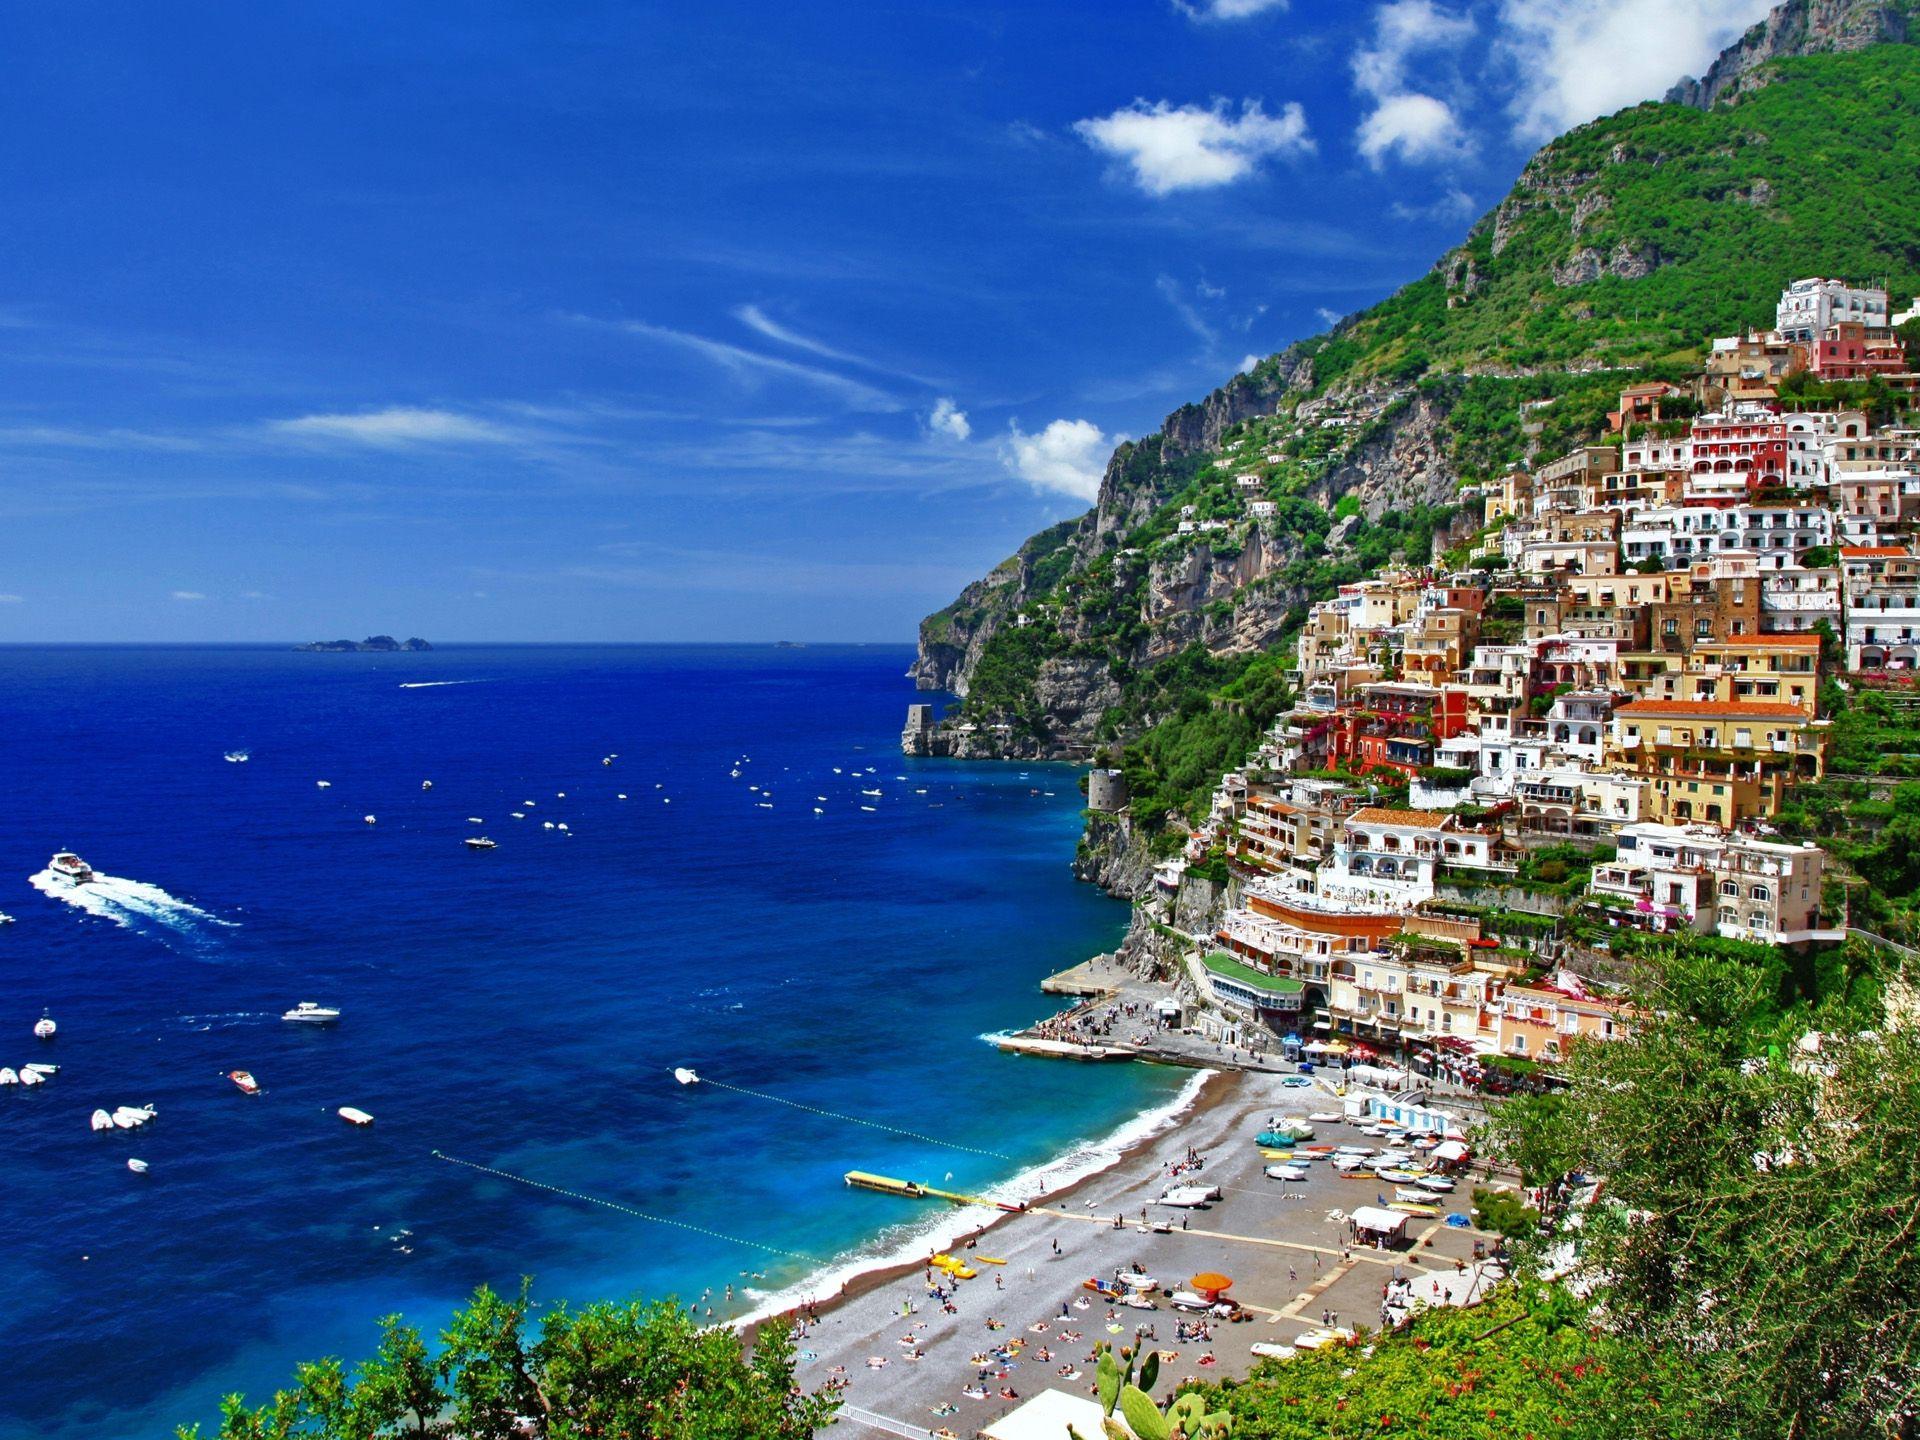 Positano Italy Wallpaper 1920x1440 21817